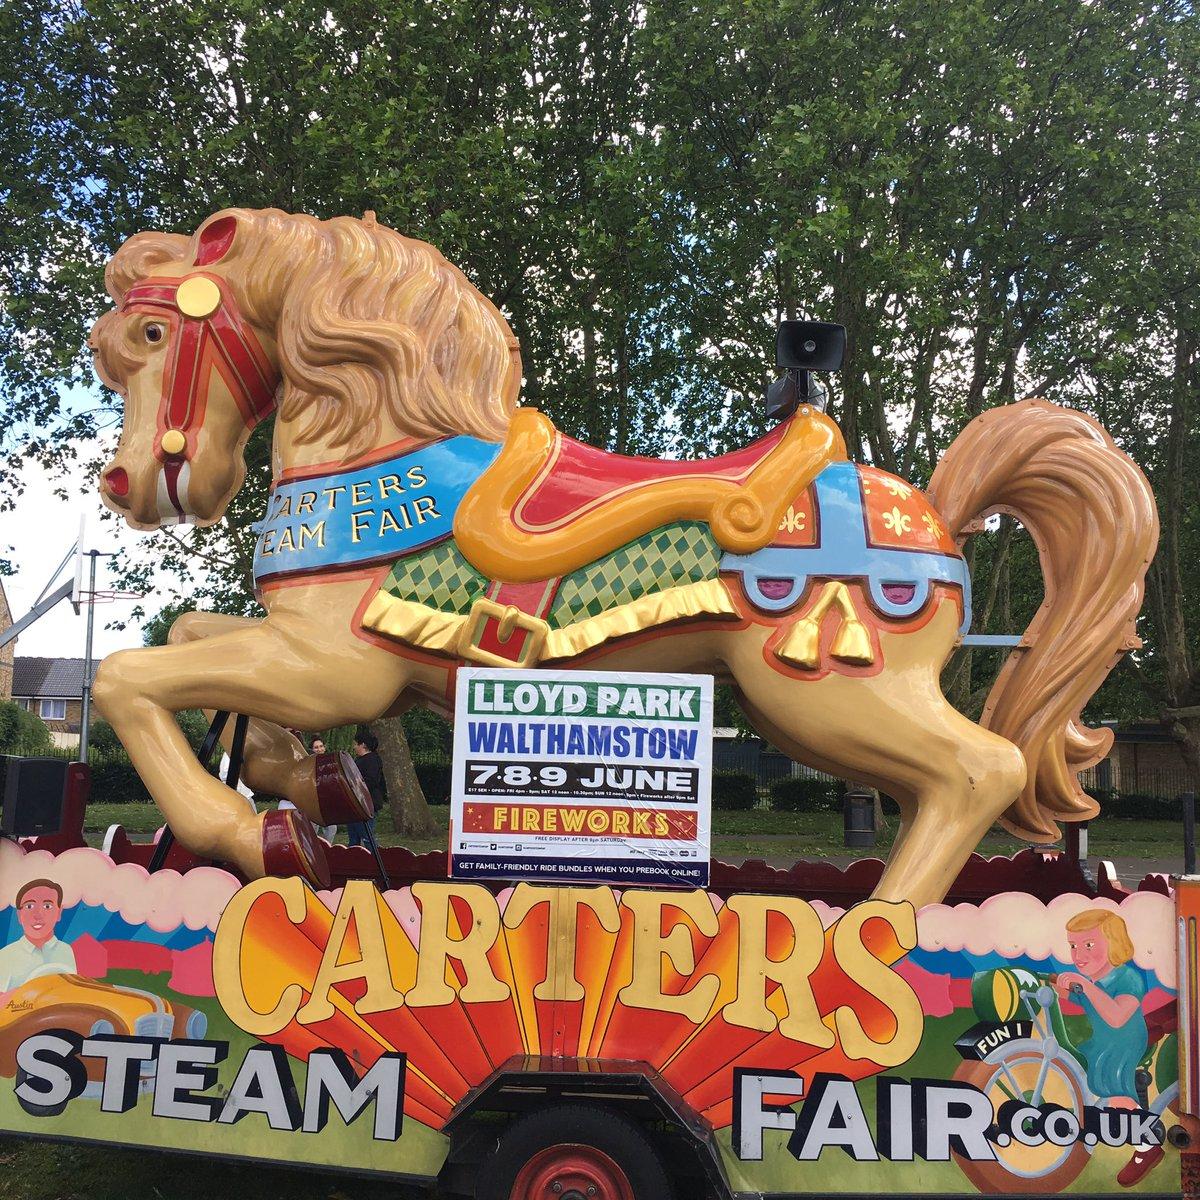 Carters Steam Fair Cartersfair Twitter Profile And Downloader Twipu